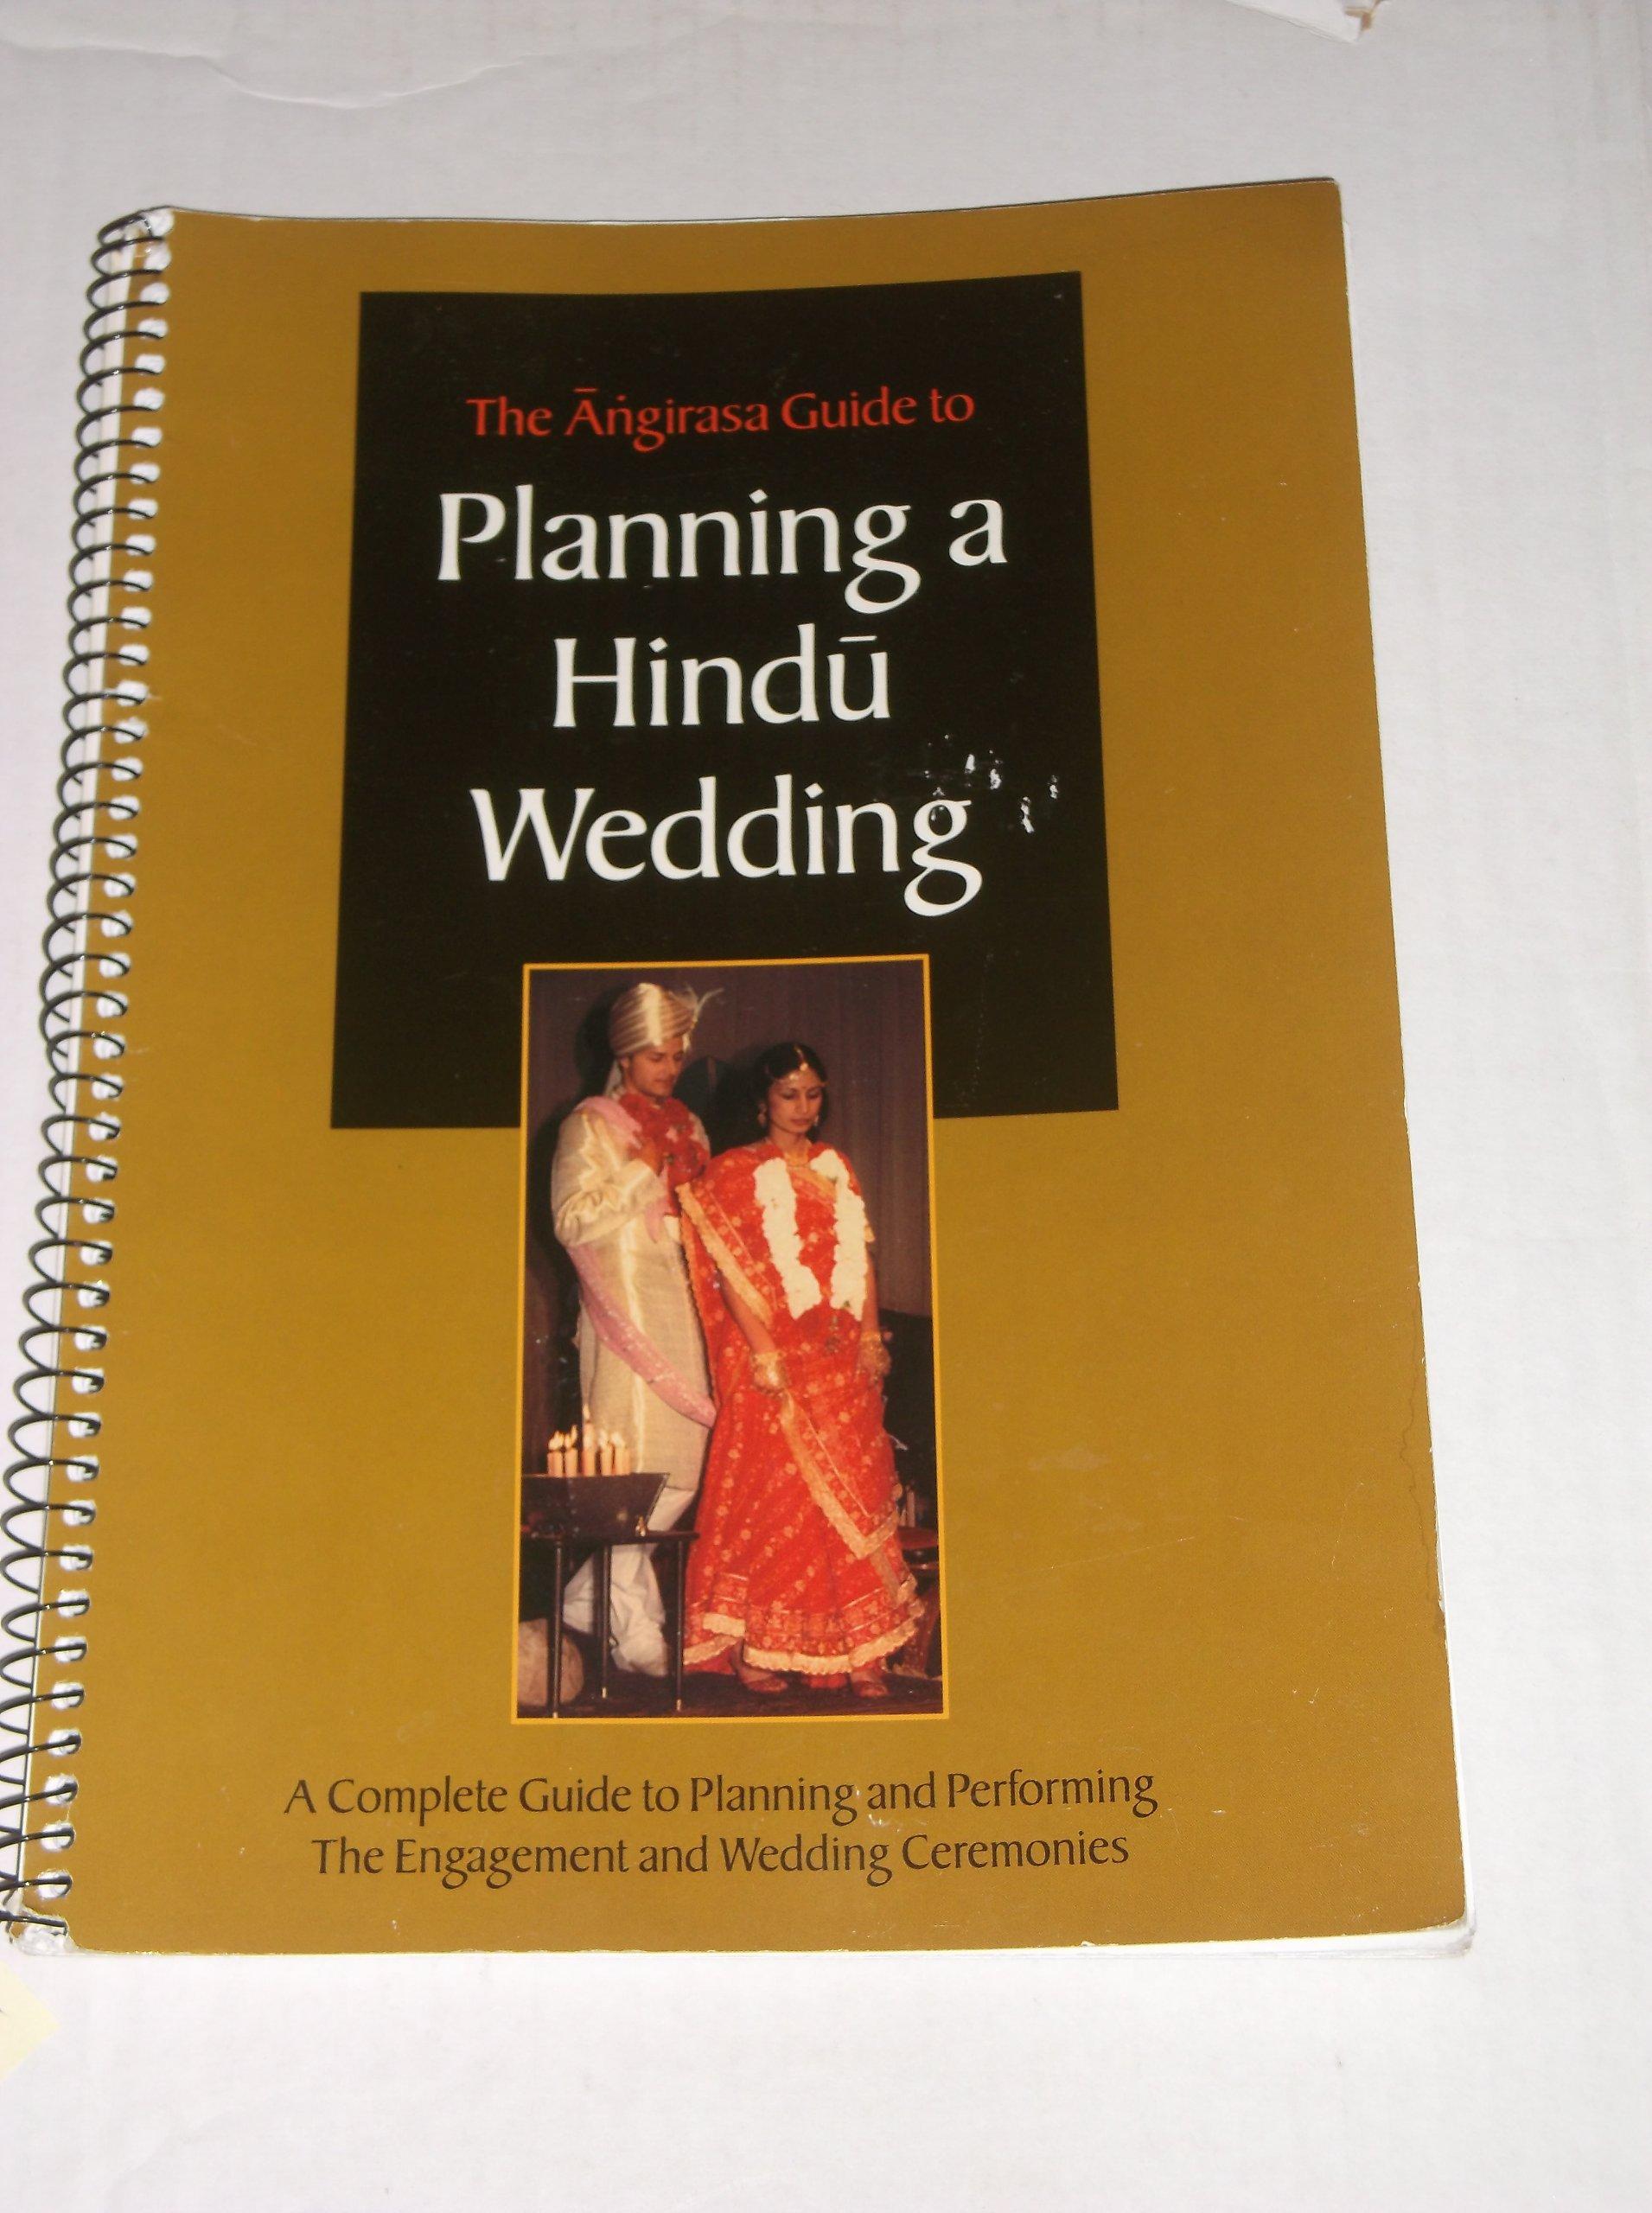 The Hindu Wedding Planner (English and Hindi Edition): Angirasa Muni